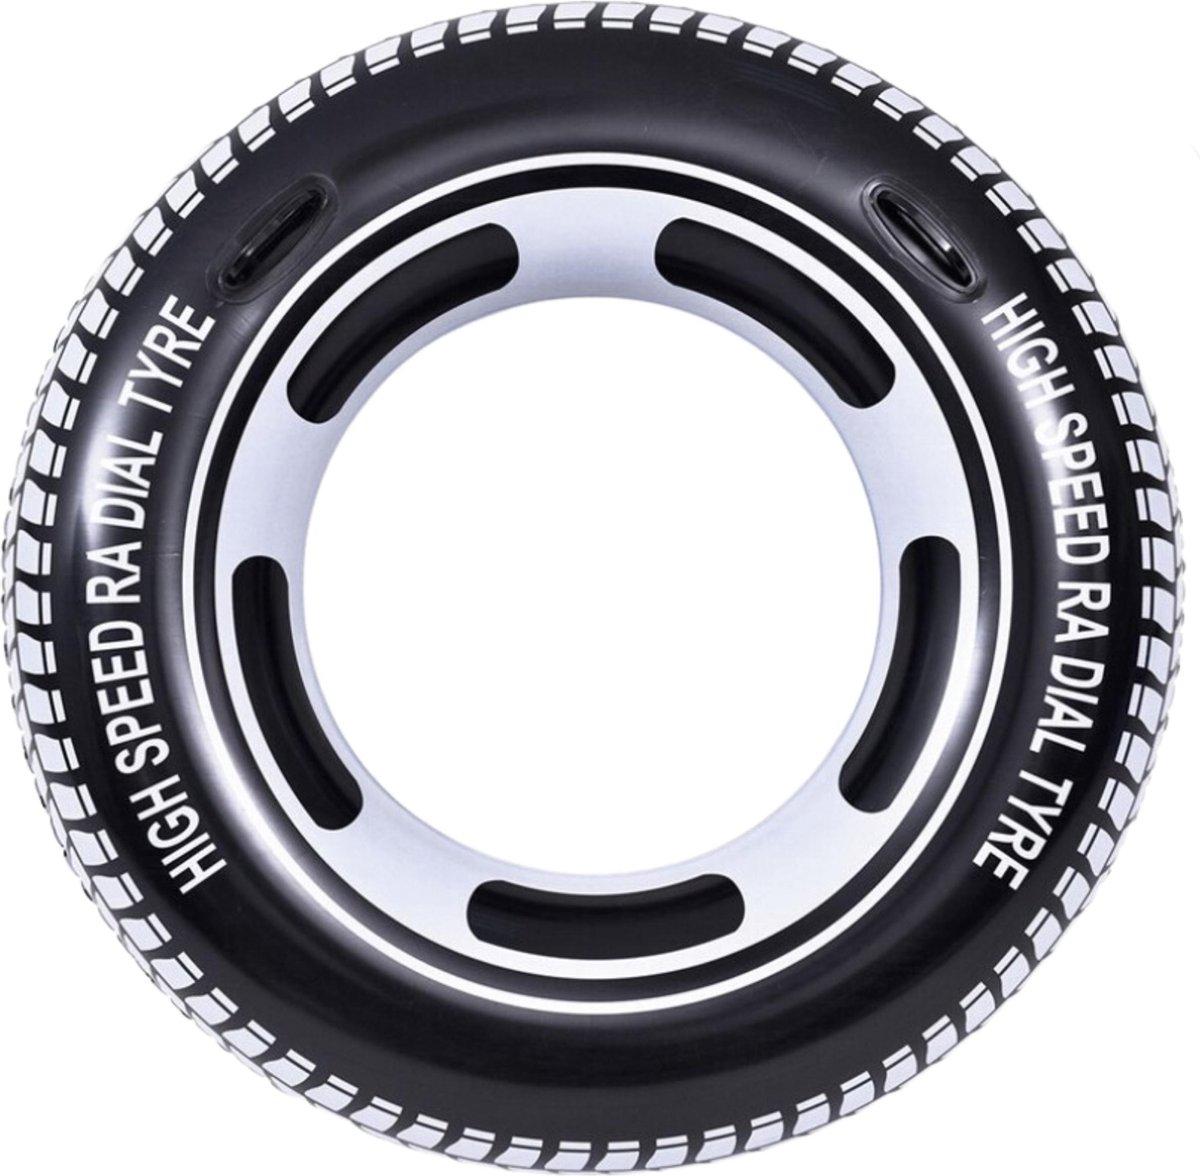 Orange85 Zwemband Tyre - Autoband - Rond - 115 cm - Extra Groot - Large - Waterspeelgoed